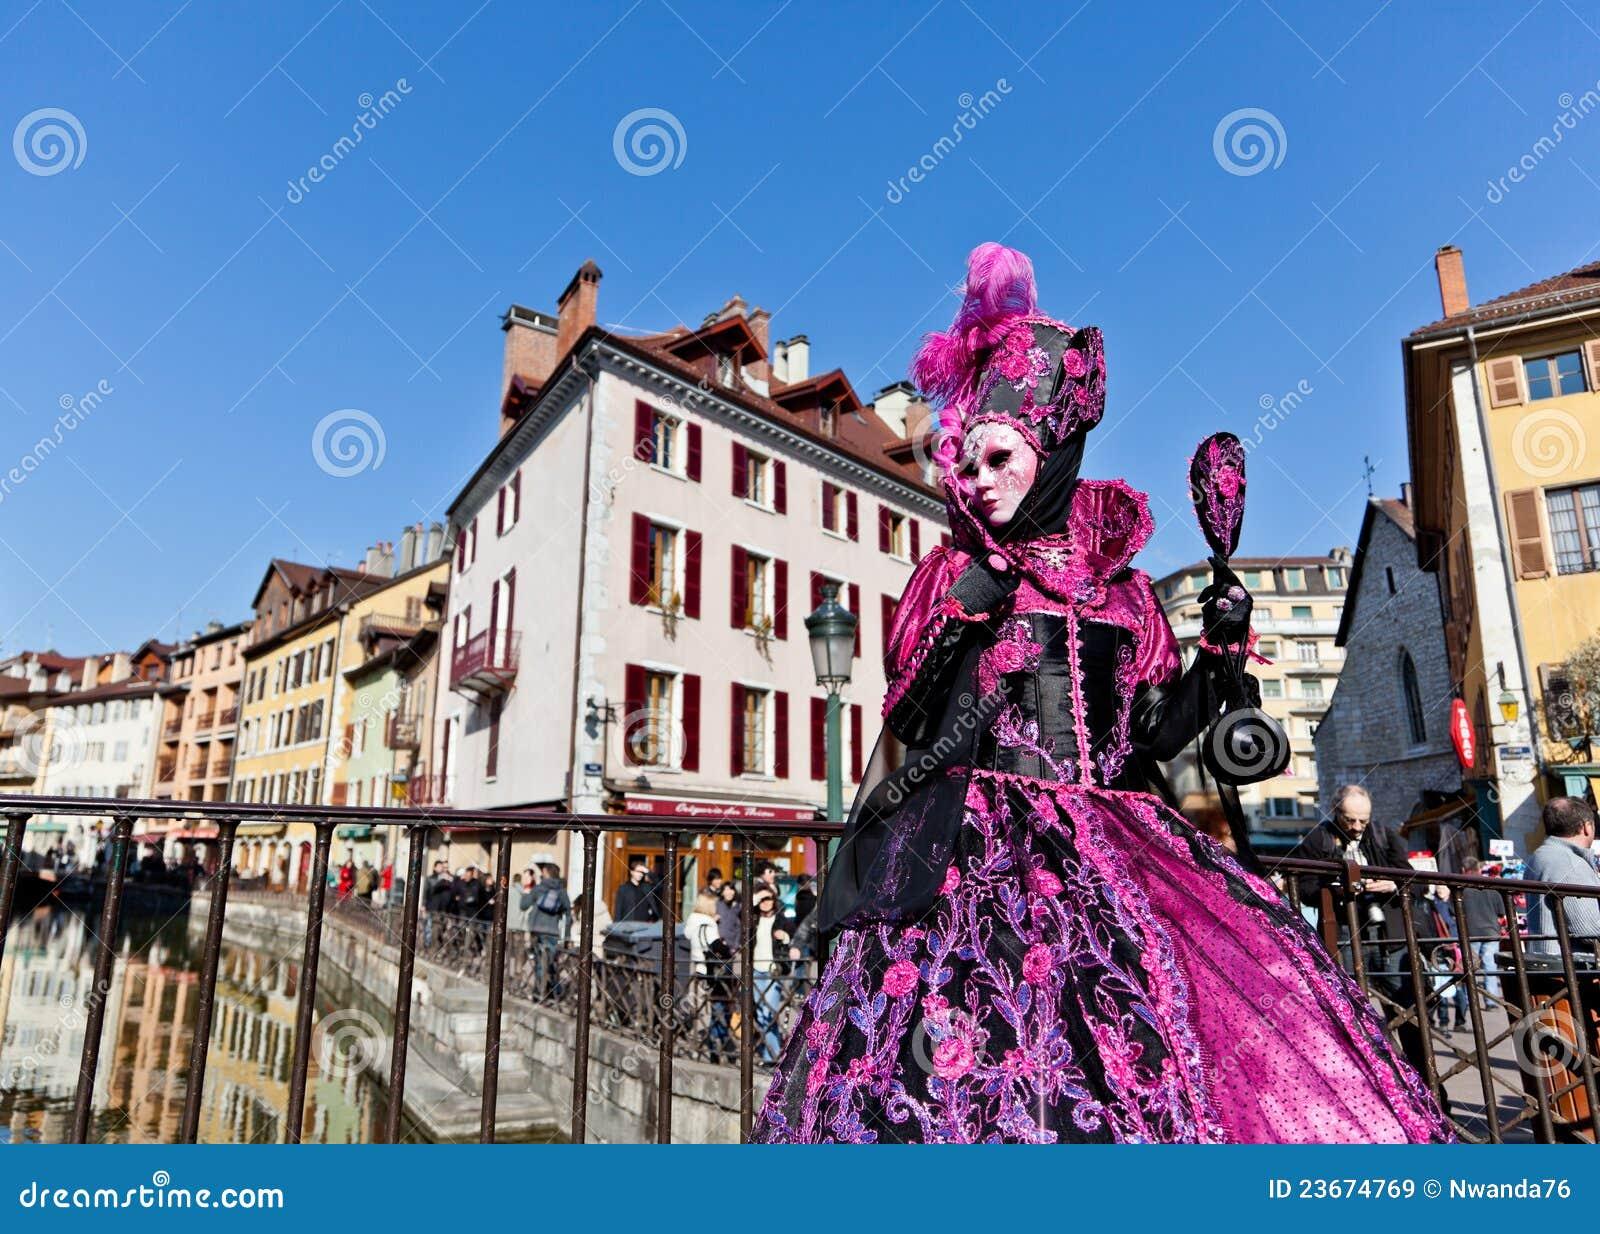 Woman in Venetian Costume